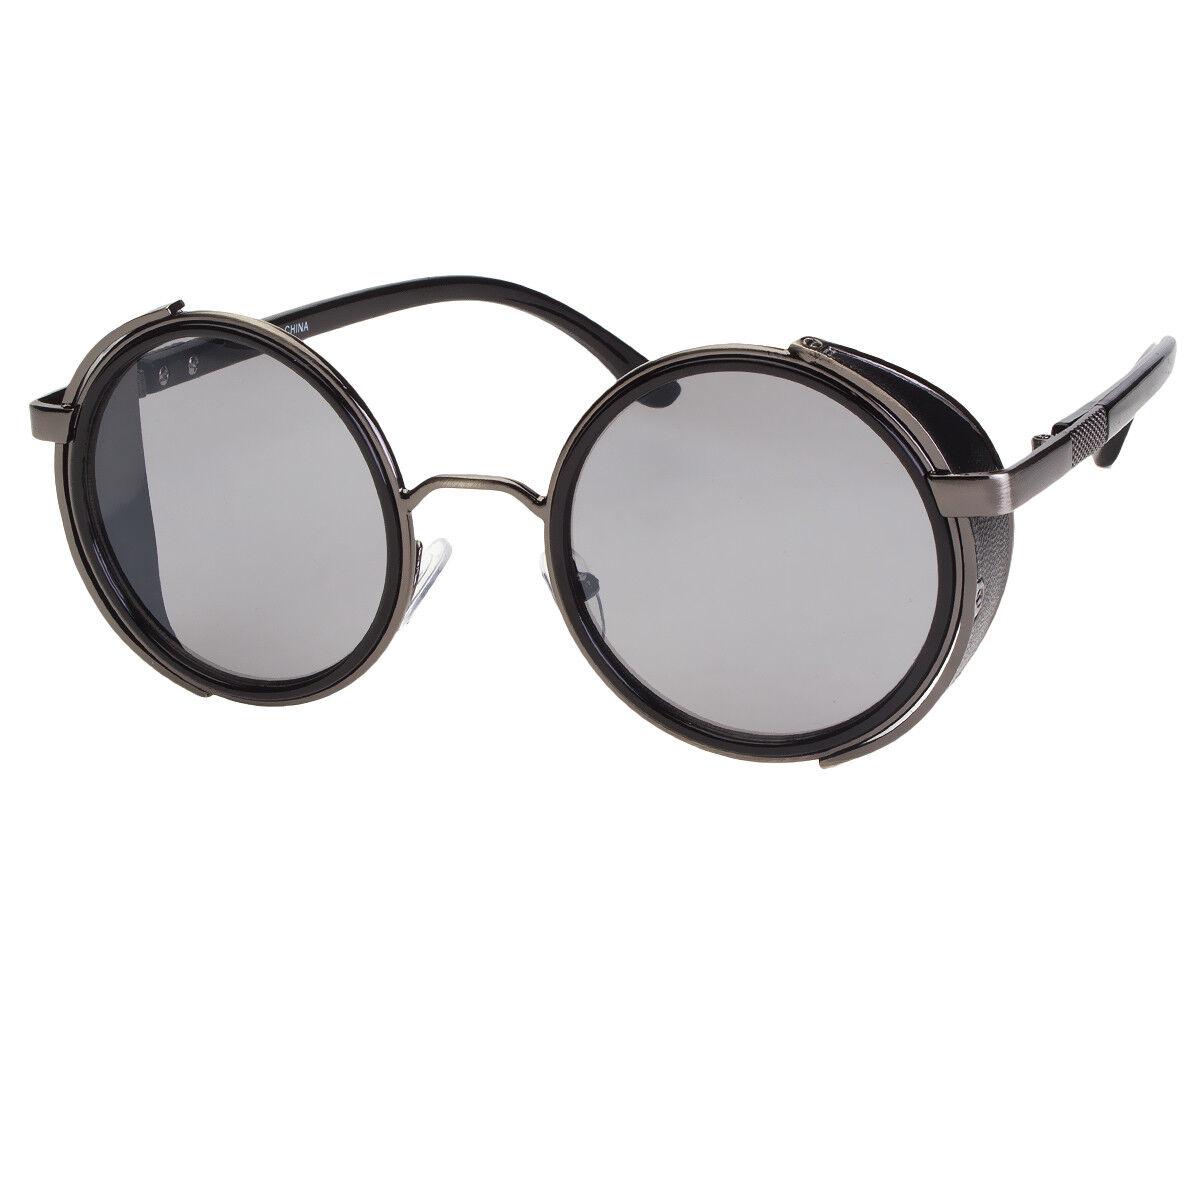 Black Old School Funky Goth Steampunk Side Shield Men Women Round Sunglasses